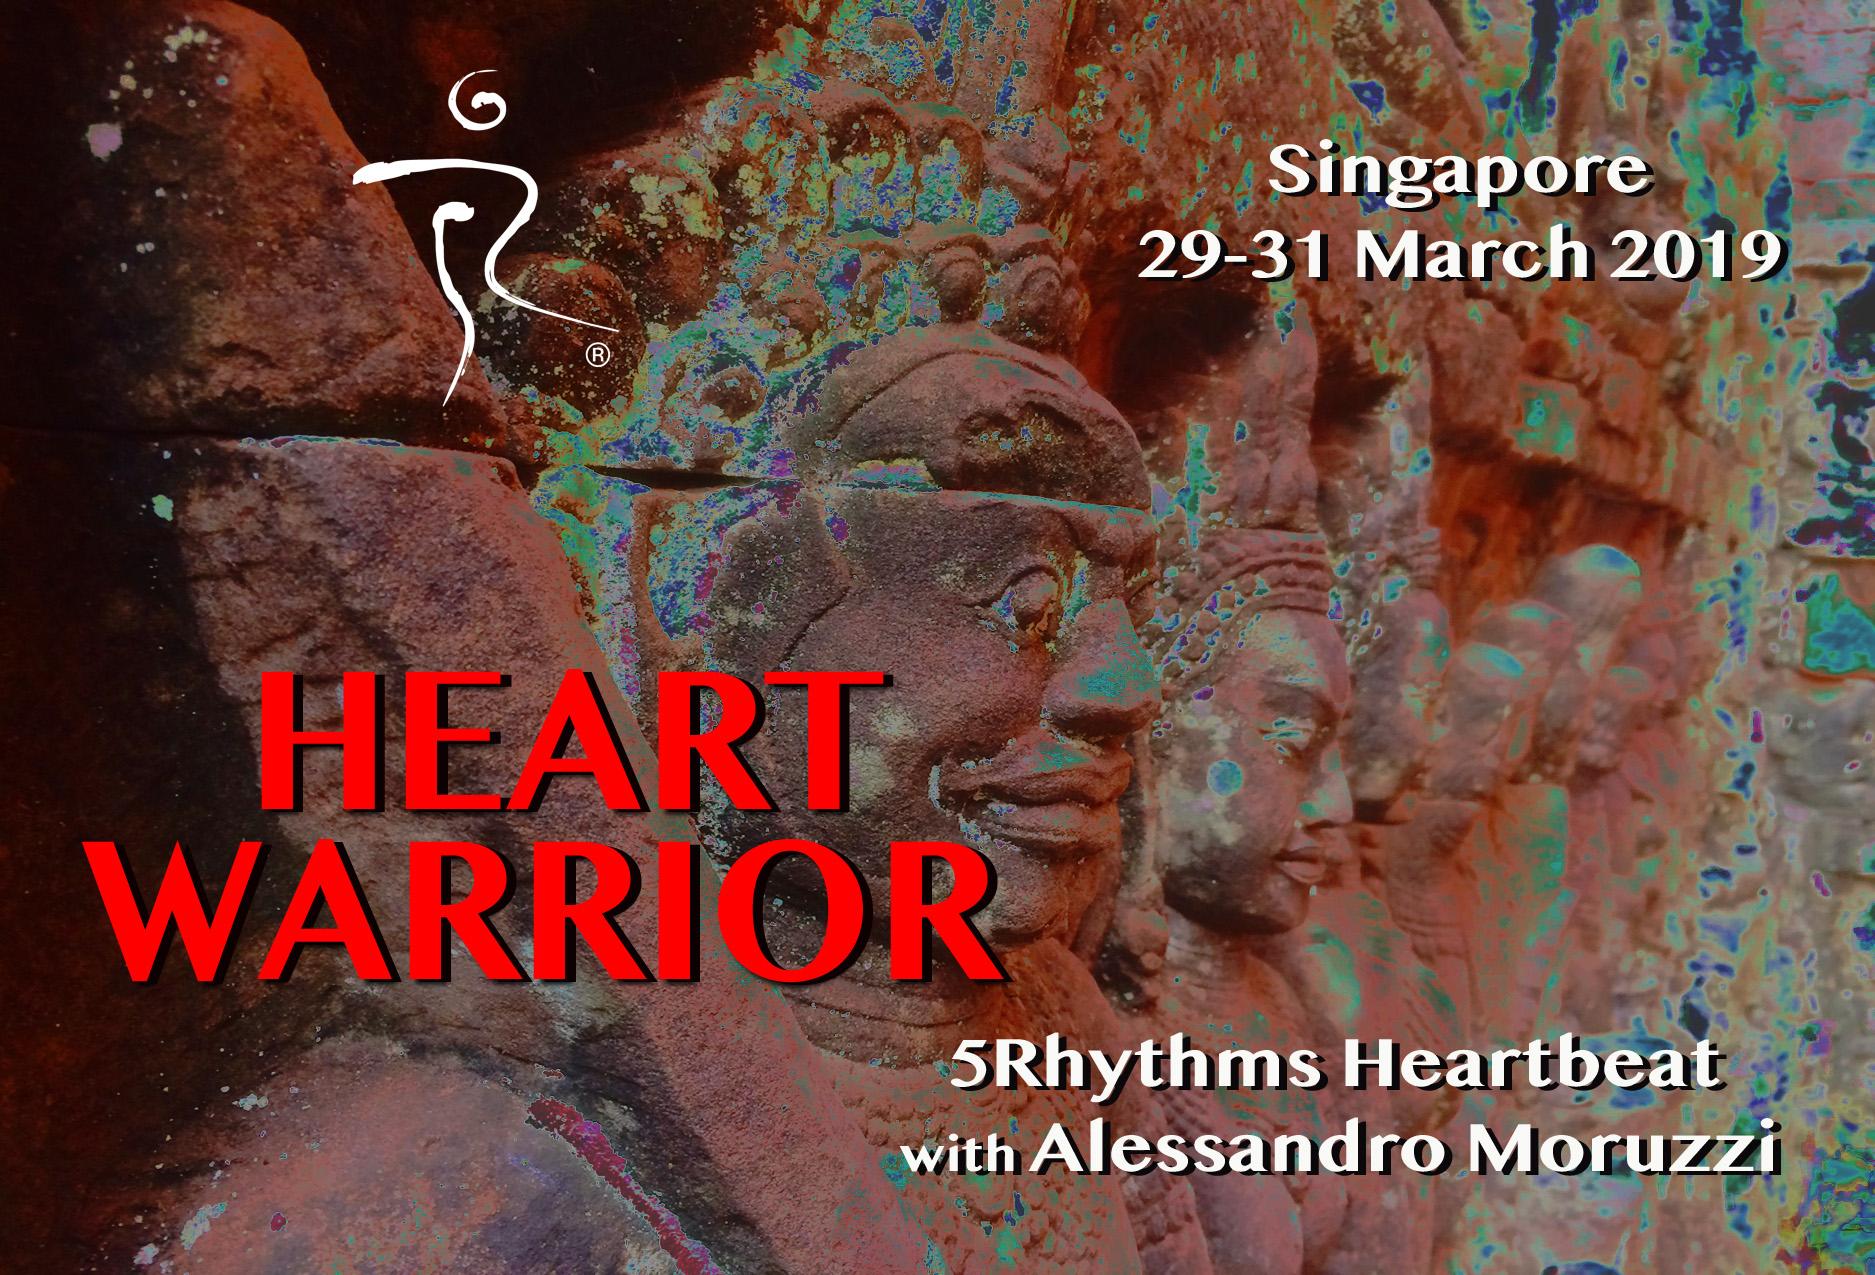 Heart Warrior 5R Heartbeat Singapore 2019 .jpg